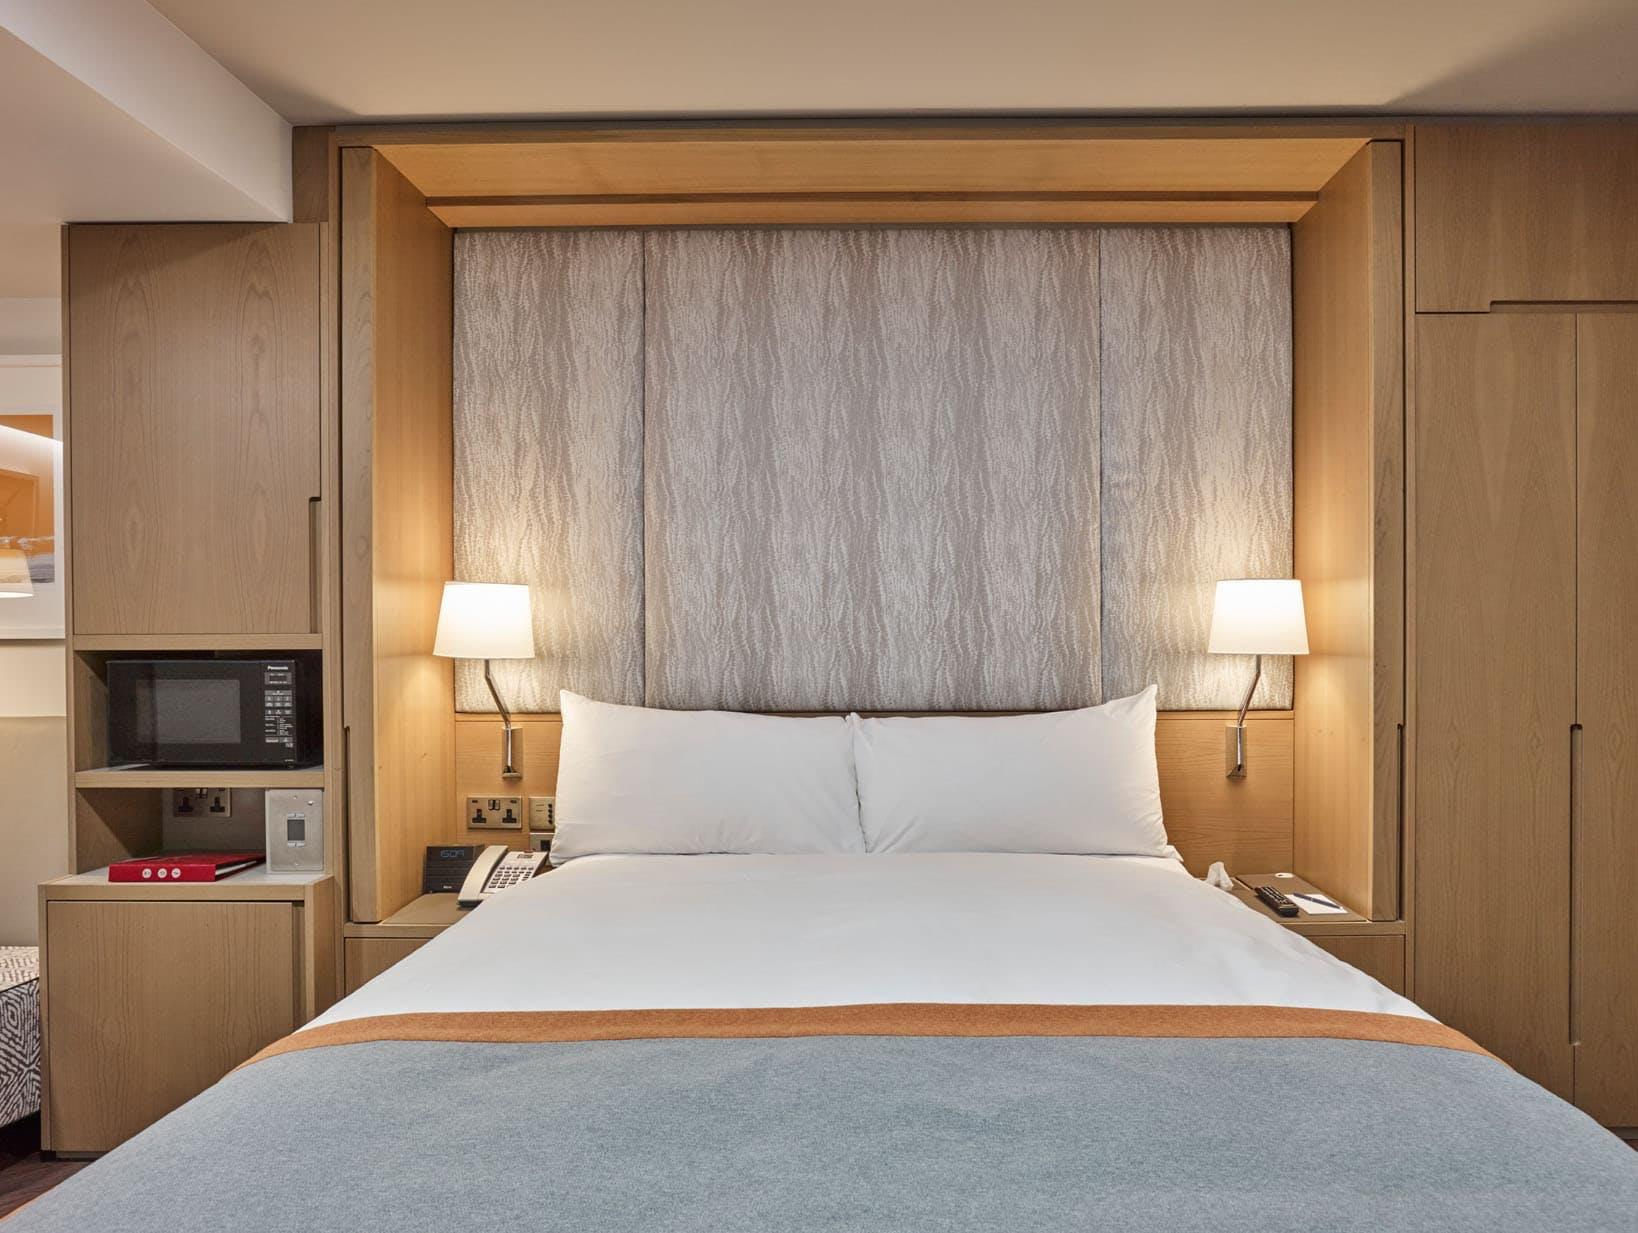 Club Level Premier Room at Club Quarters Hotel, Lincoln's Inn Fields